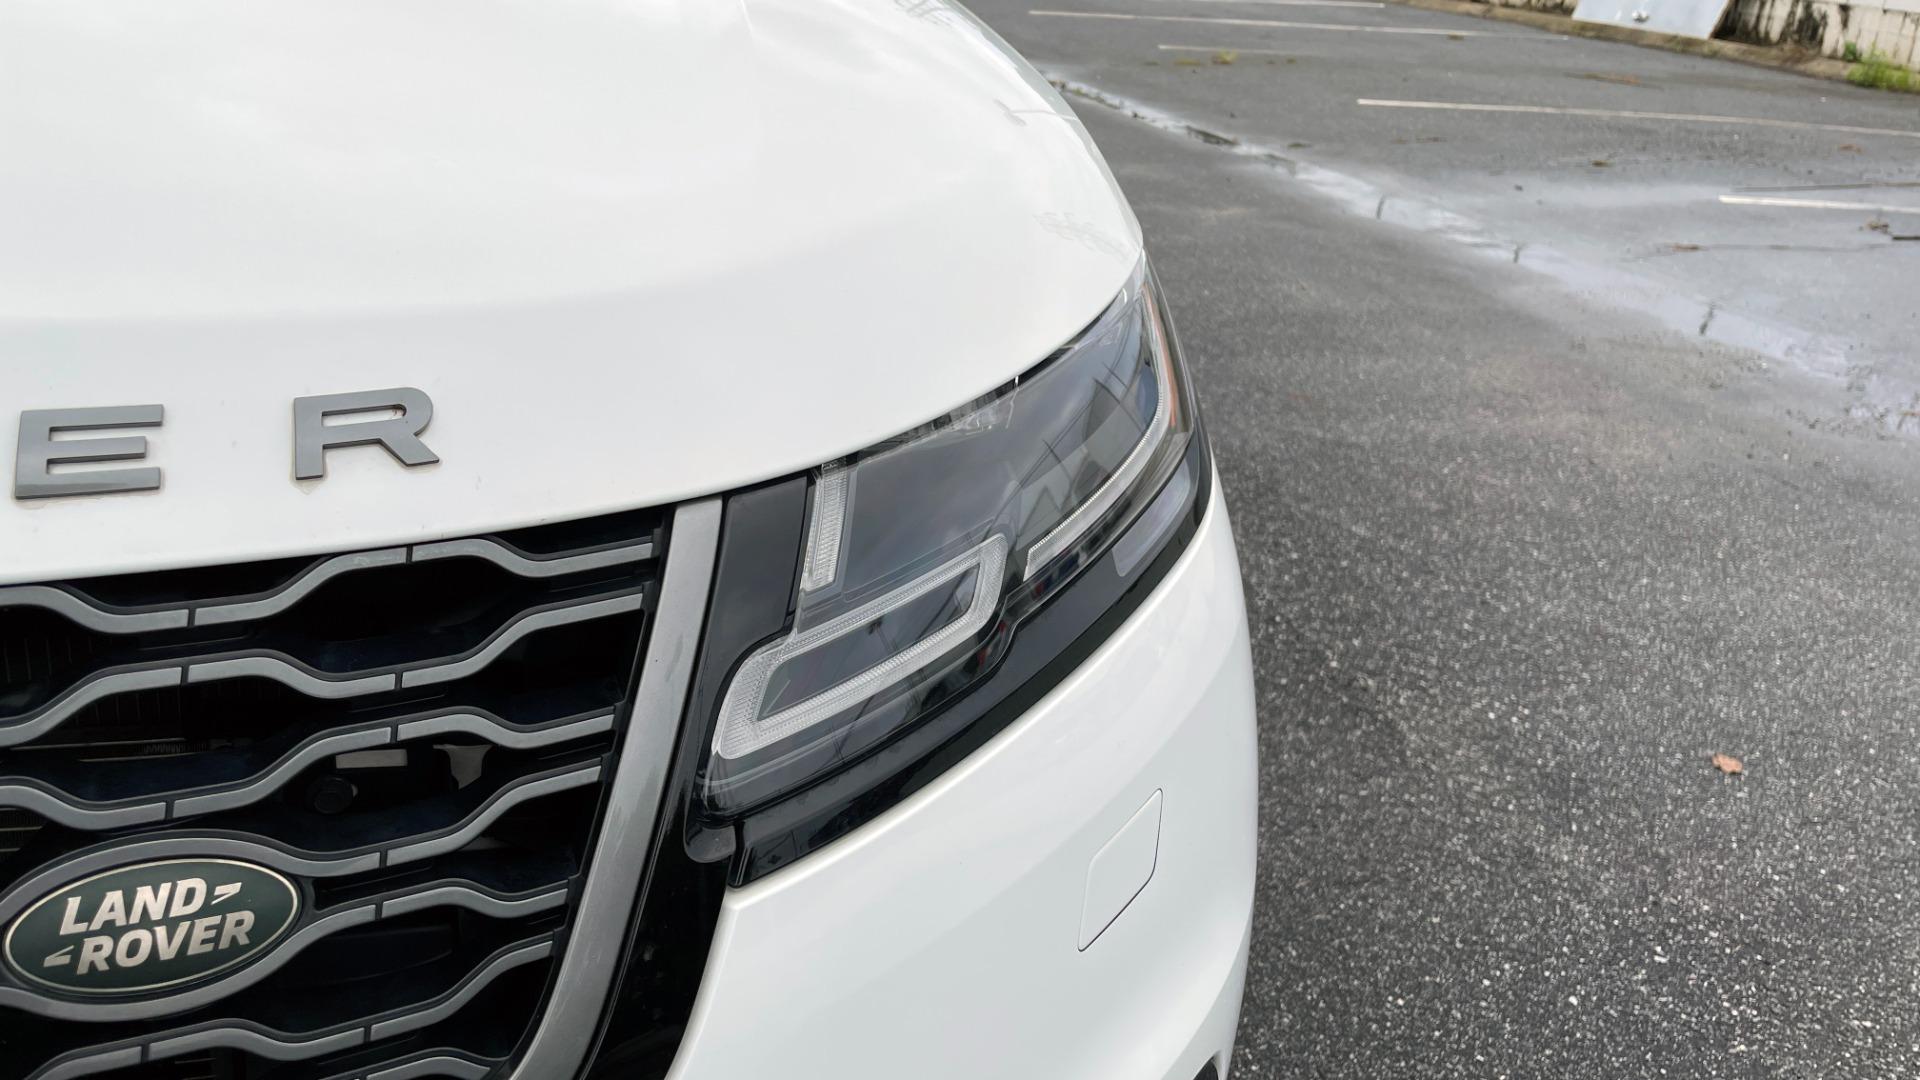 Used 2018 Land Rover RANGE ROVER VELAR R-DYNAMIC SE / NAV / PREM / MERIDIAN / SUNROOF / REARVIEW for sale $54,995 at Formula Imports in Charlotte NC 28227 12